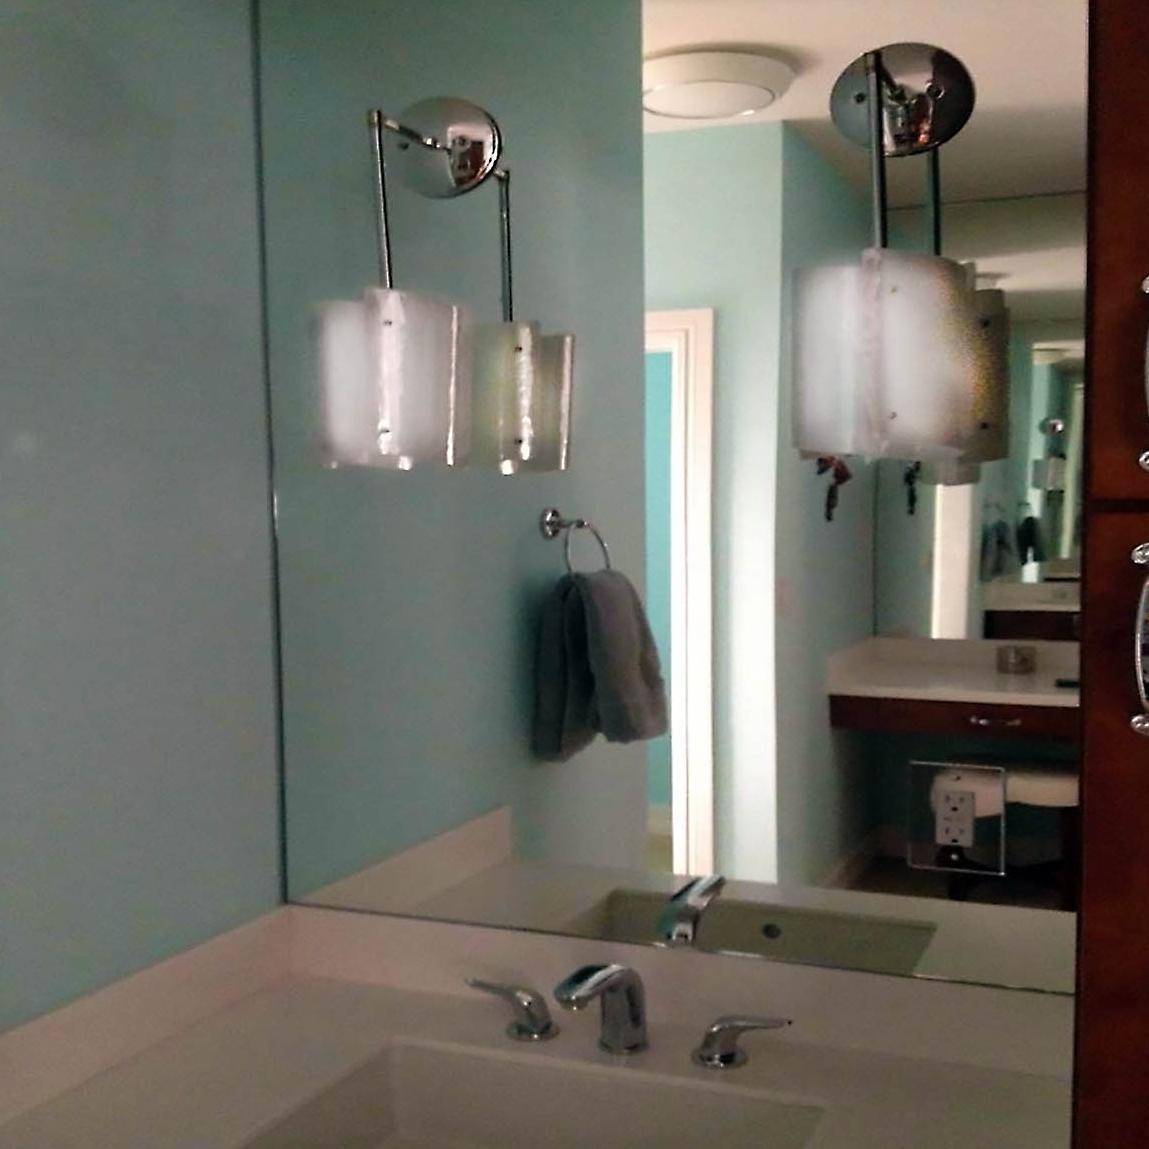 Pendant sconces in a bathroom